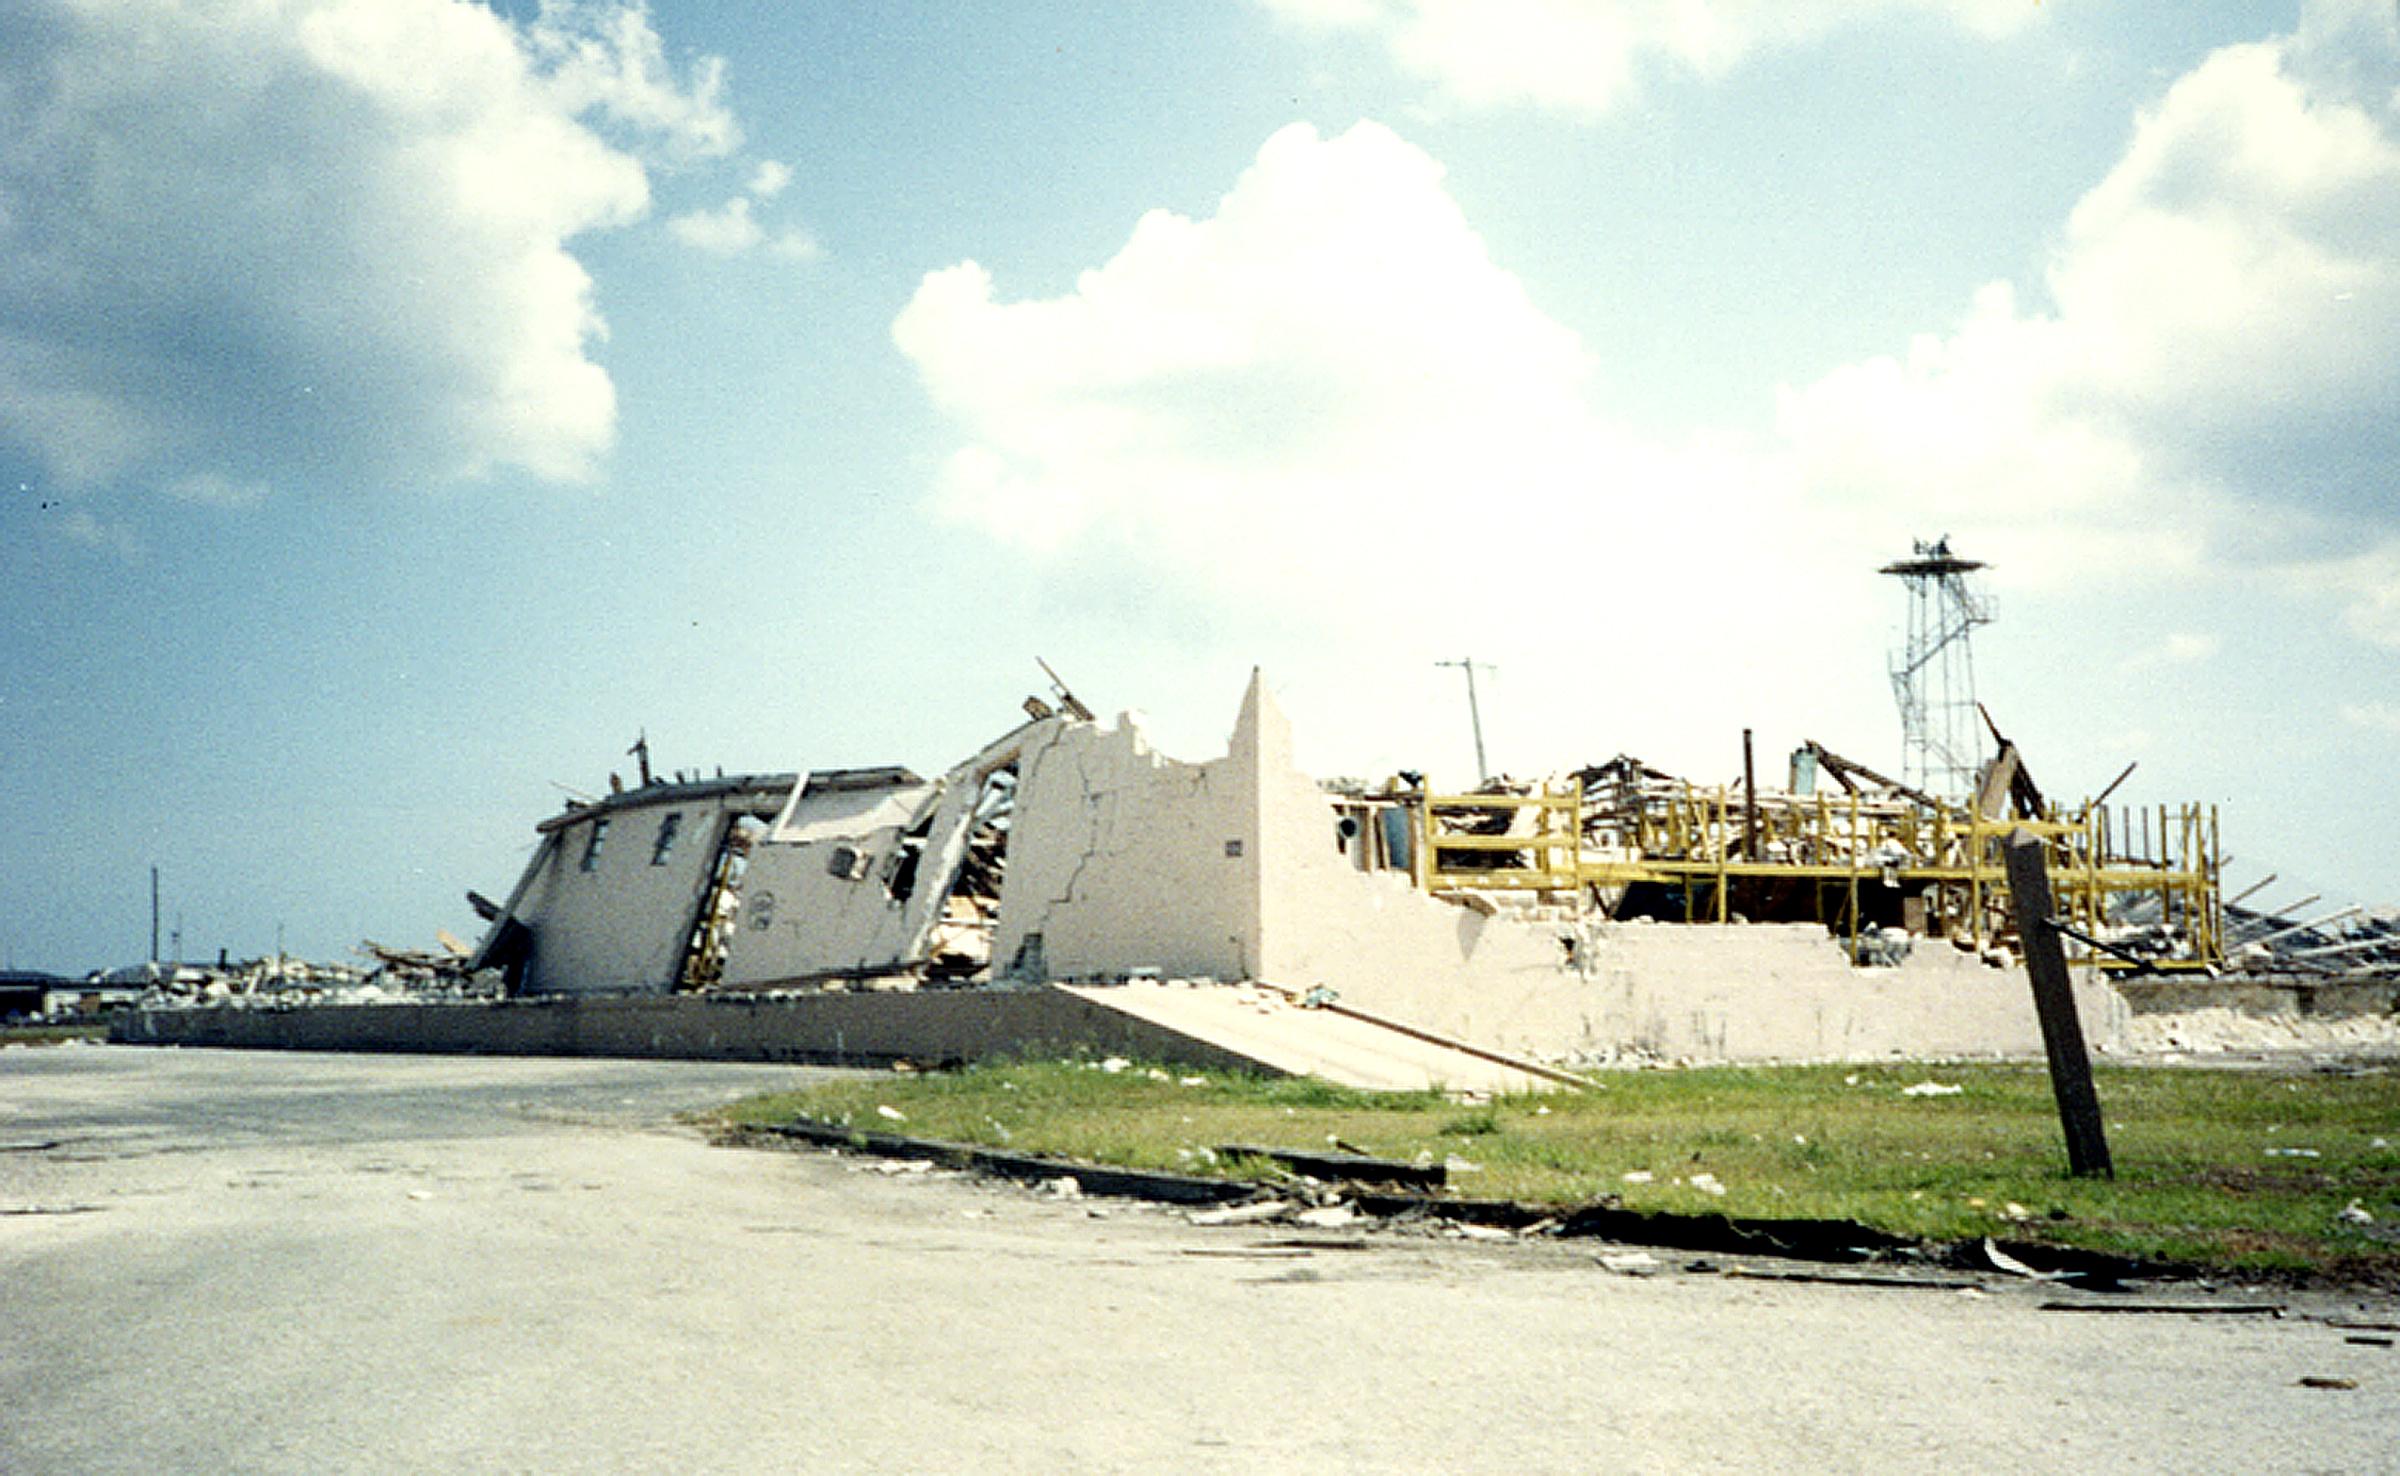 homestead afb black dating site Military callsign list kwajalein test site abrum c-130e 43rd og pope afb akula f-15a/b 125th fw det 1, homestead ars ars fl.